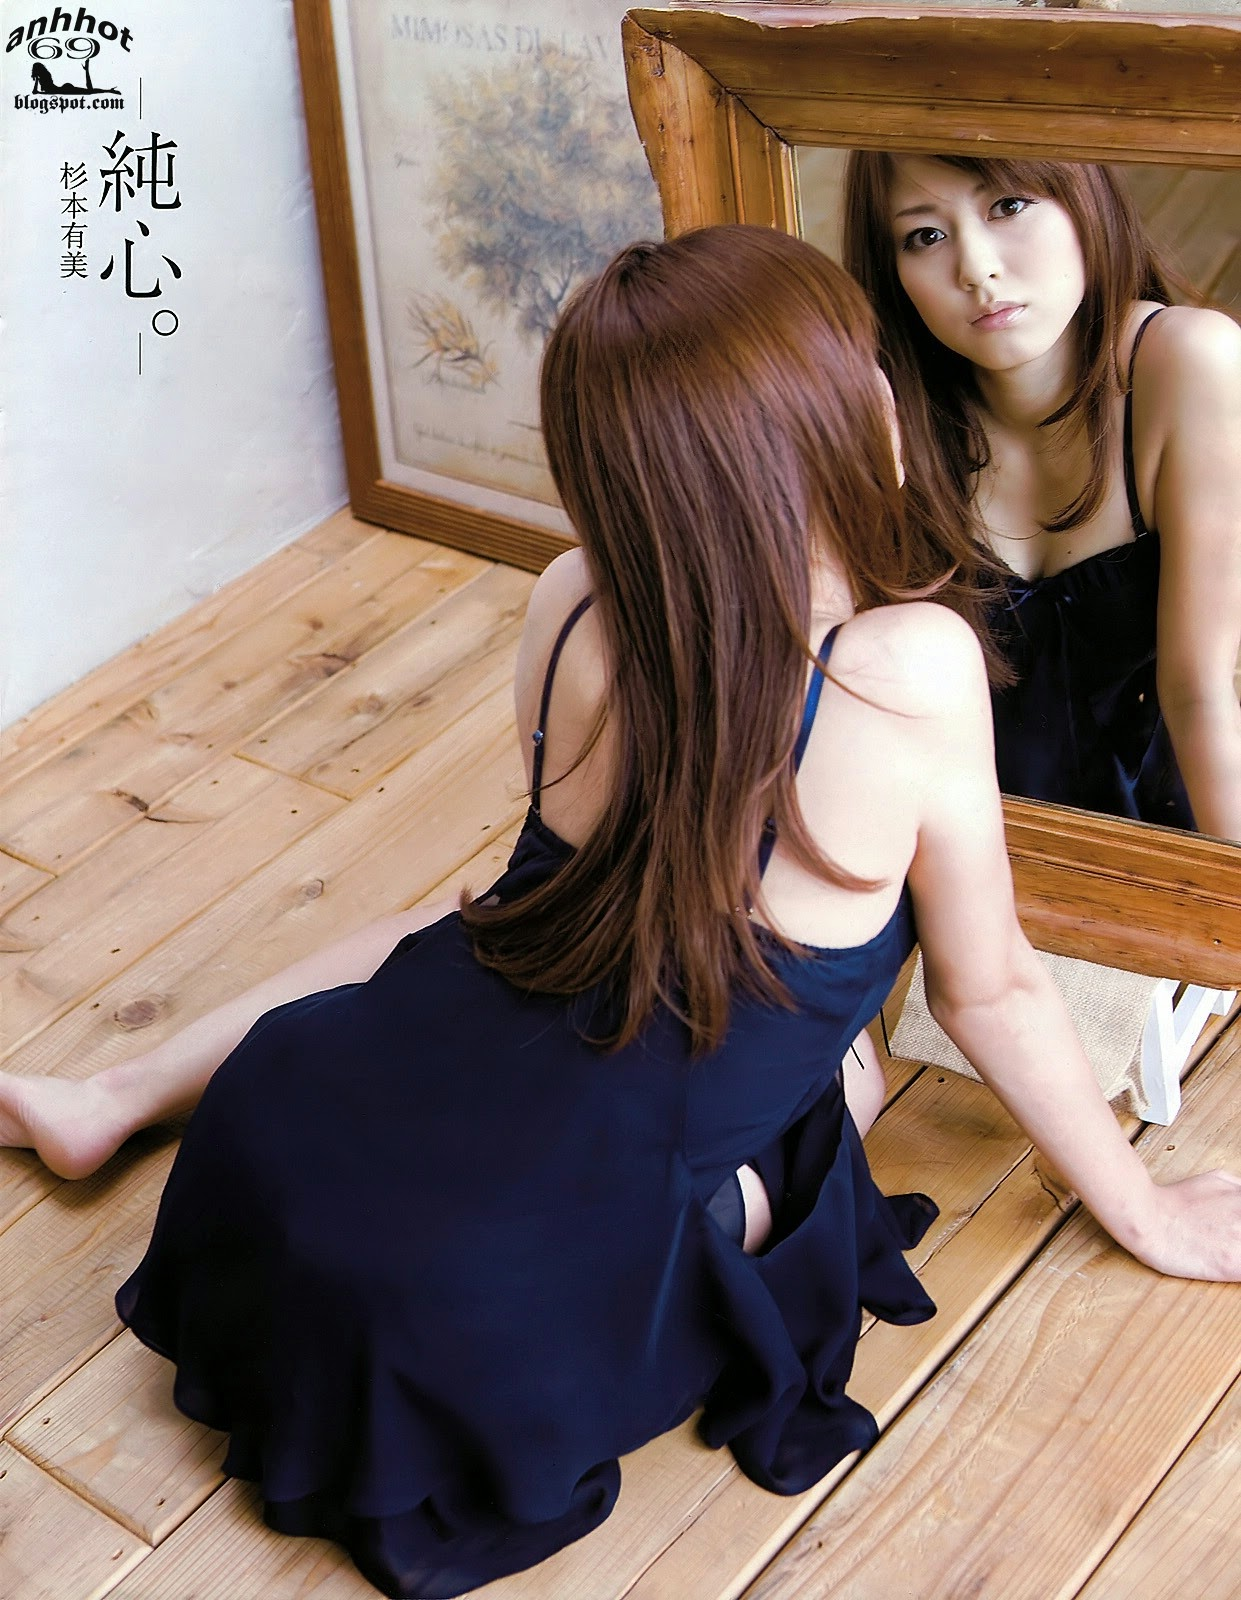 yumi-sugimoto-00561113